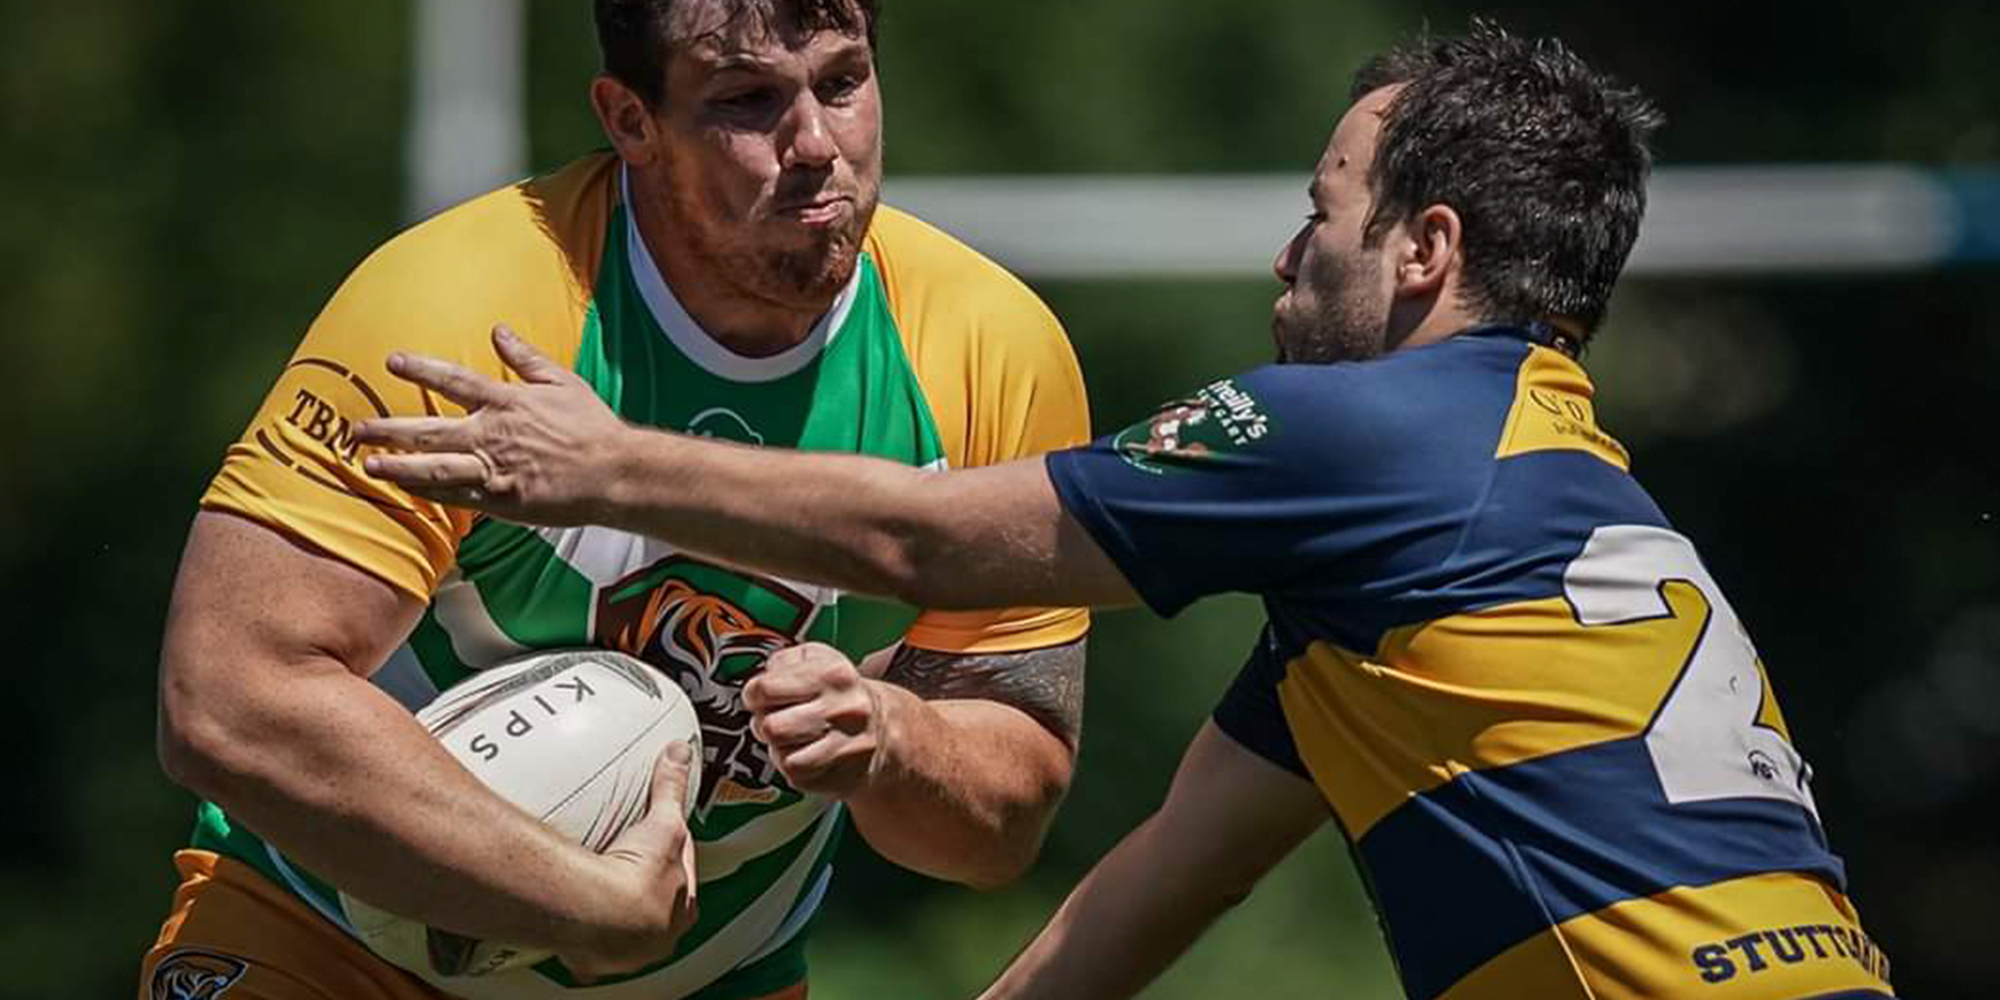 Markus Bachofer, TBN Rugby